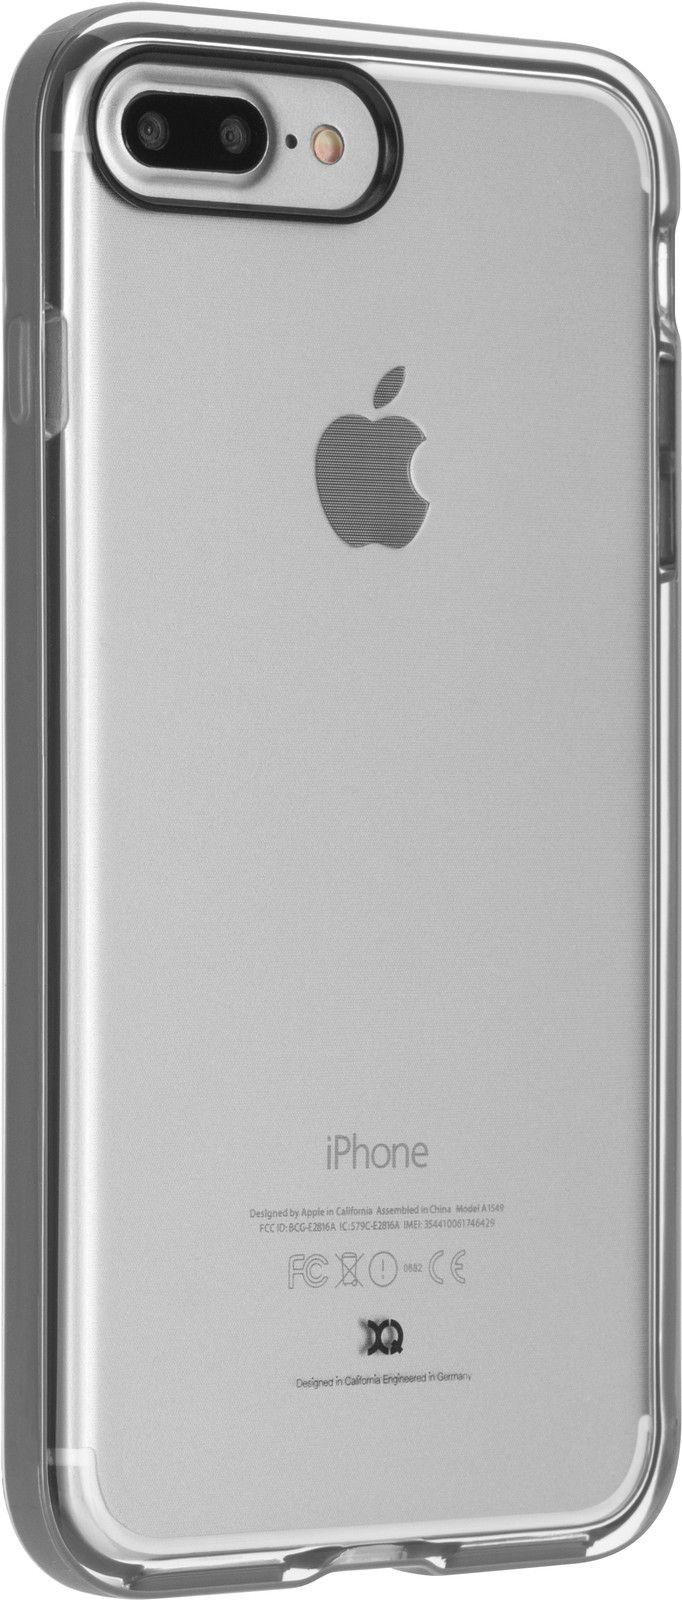 Xqisit Phantom Xcel (iPhone 7 Plus) – Vit/transparent